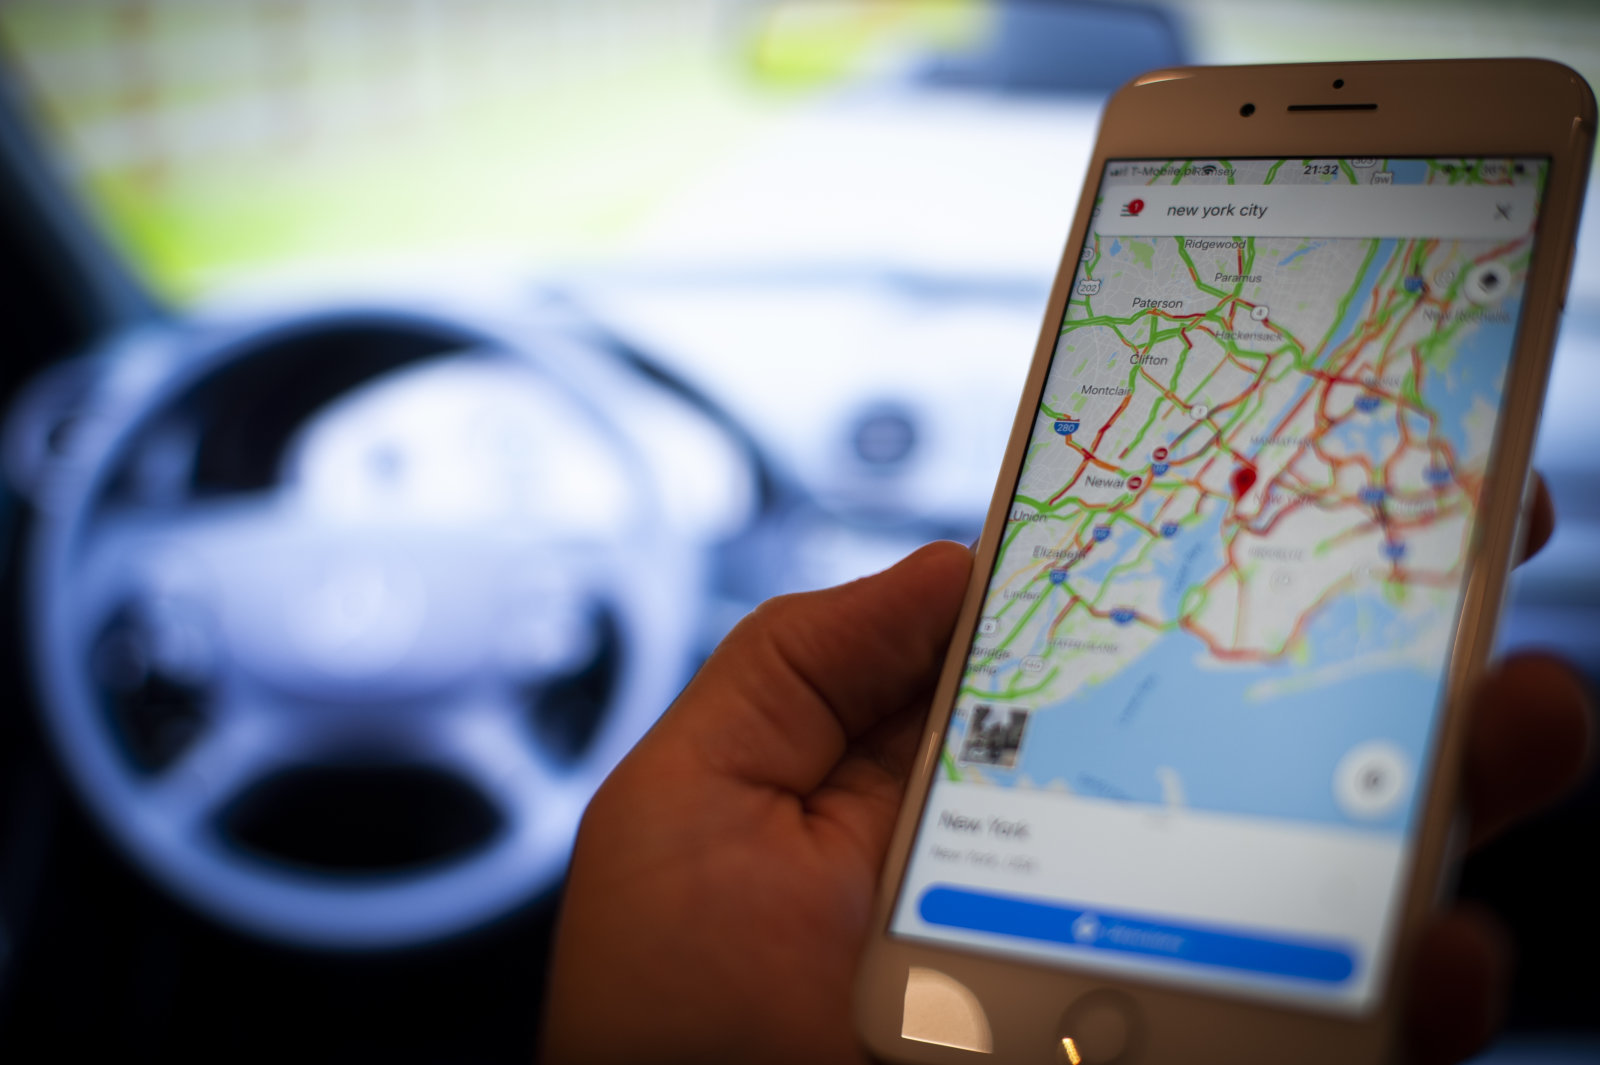 Global Mobile news round-up, November 16th - Blog - MEF